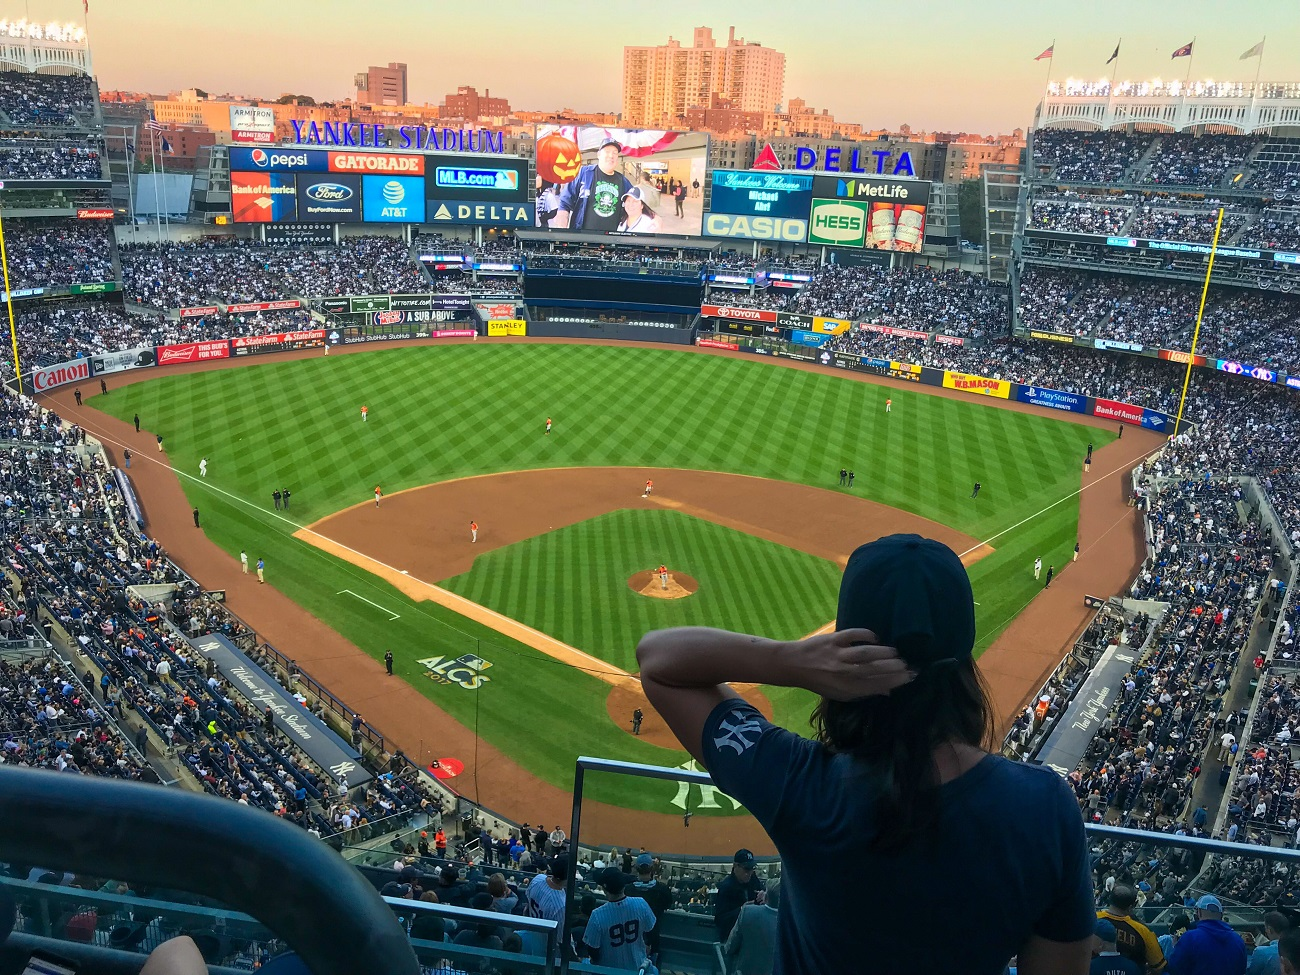 Yankee Stadium from the Upper Deck